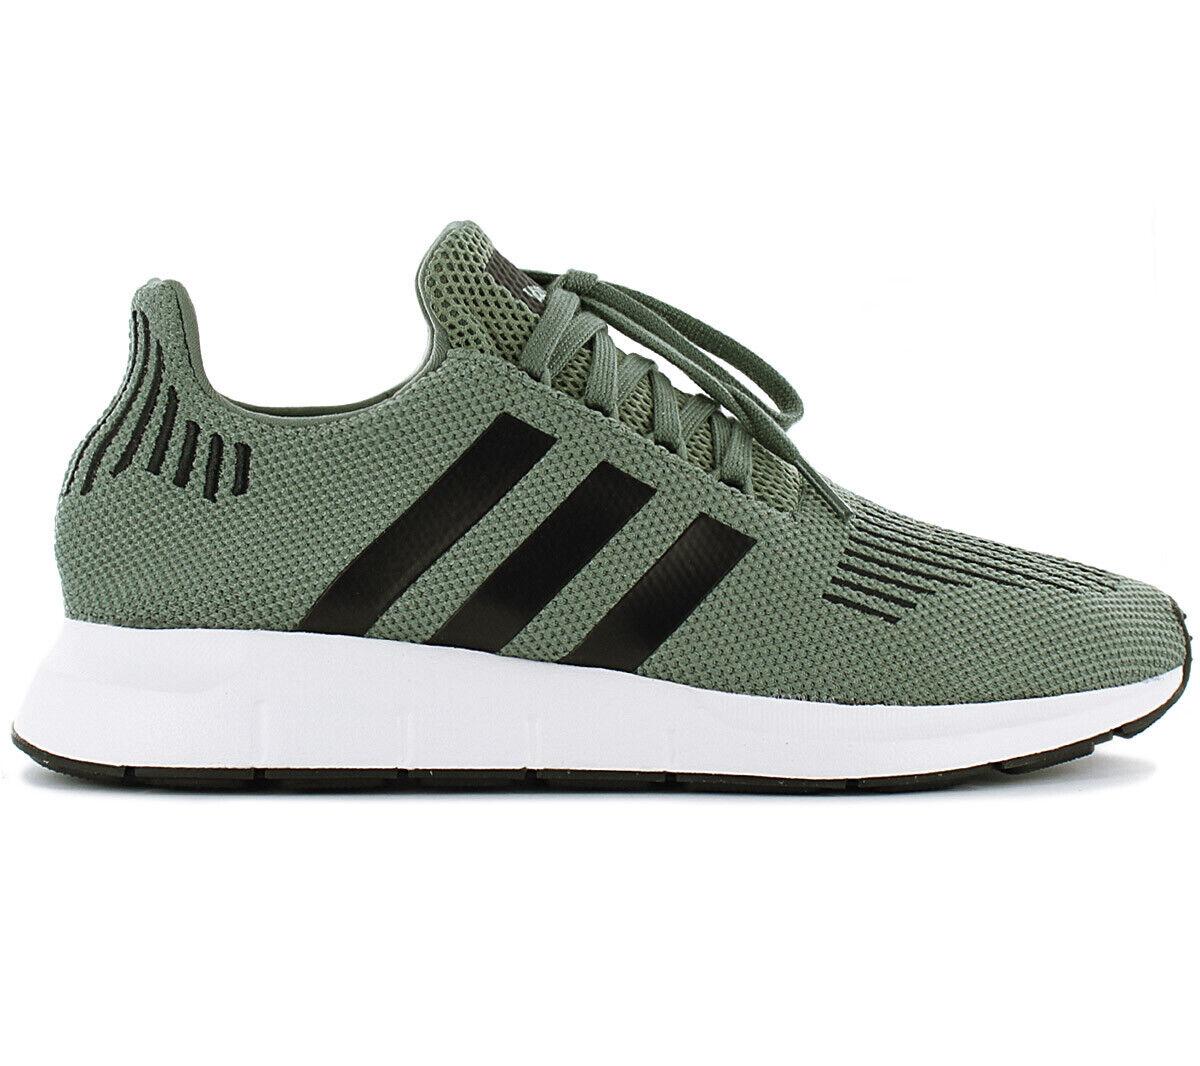 Adidas Originals Swift Run Herren Turnschuhe Schuhe CG4115 Grün Turnschuhe Turnschuhe Turnschuhe NEU 35775e